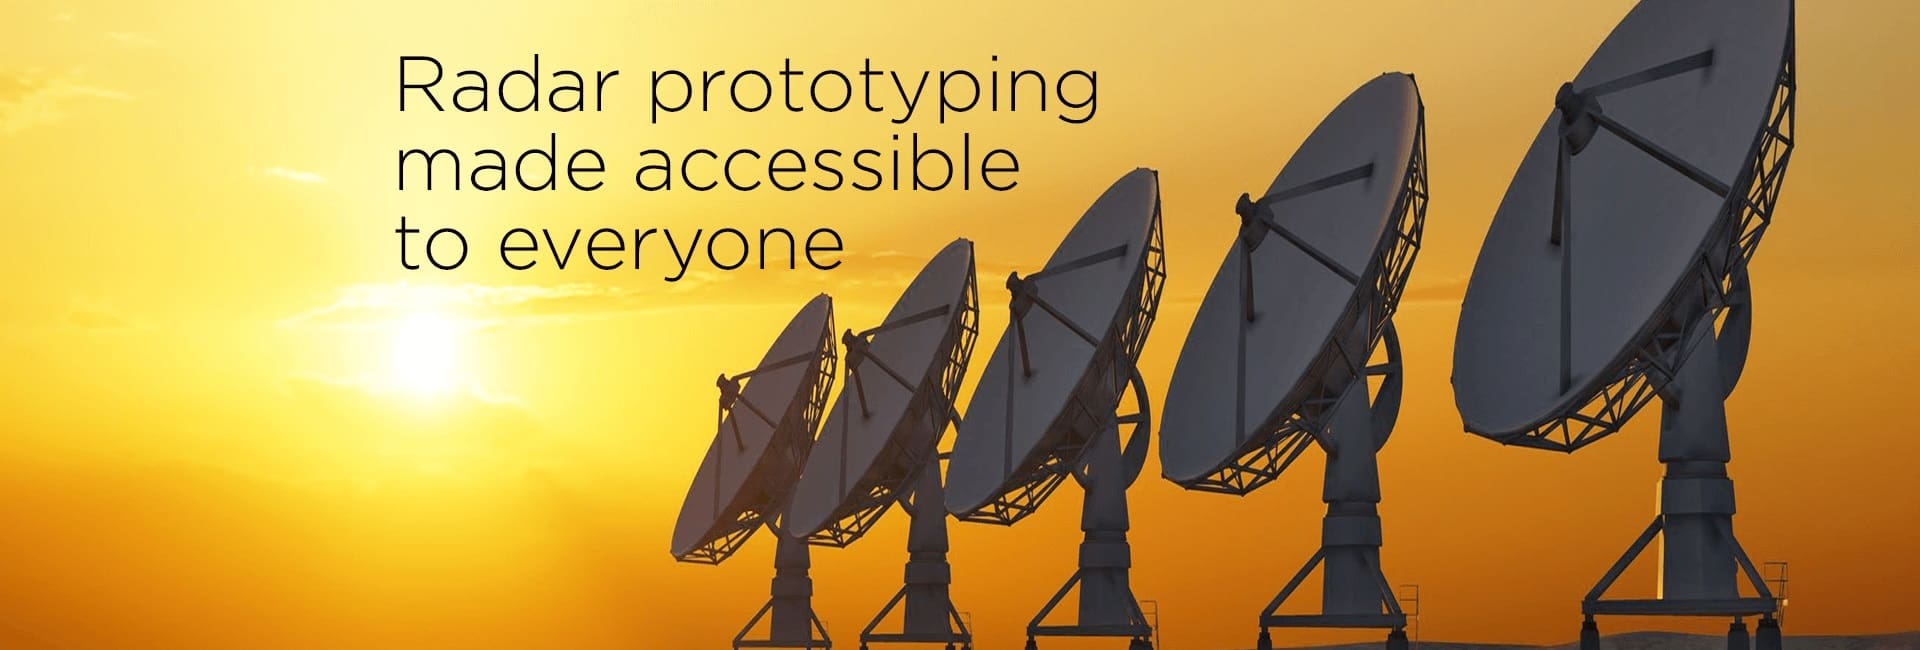 radar_prototyping-min